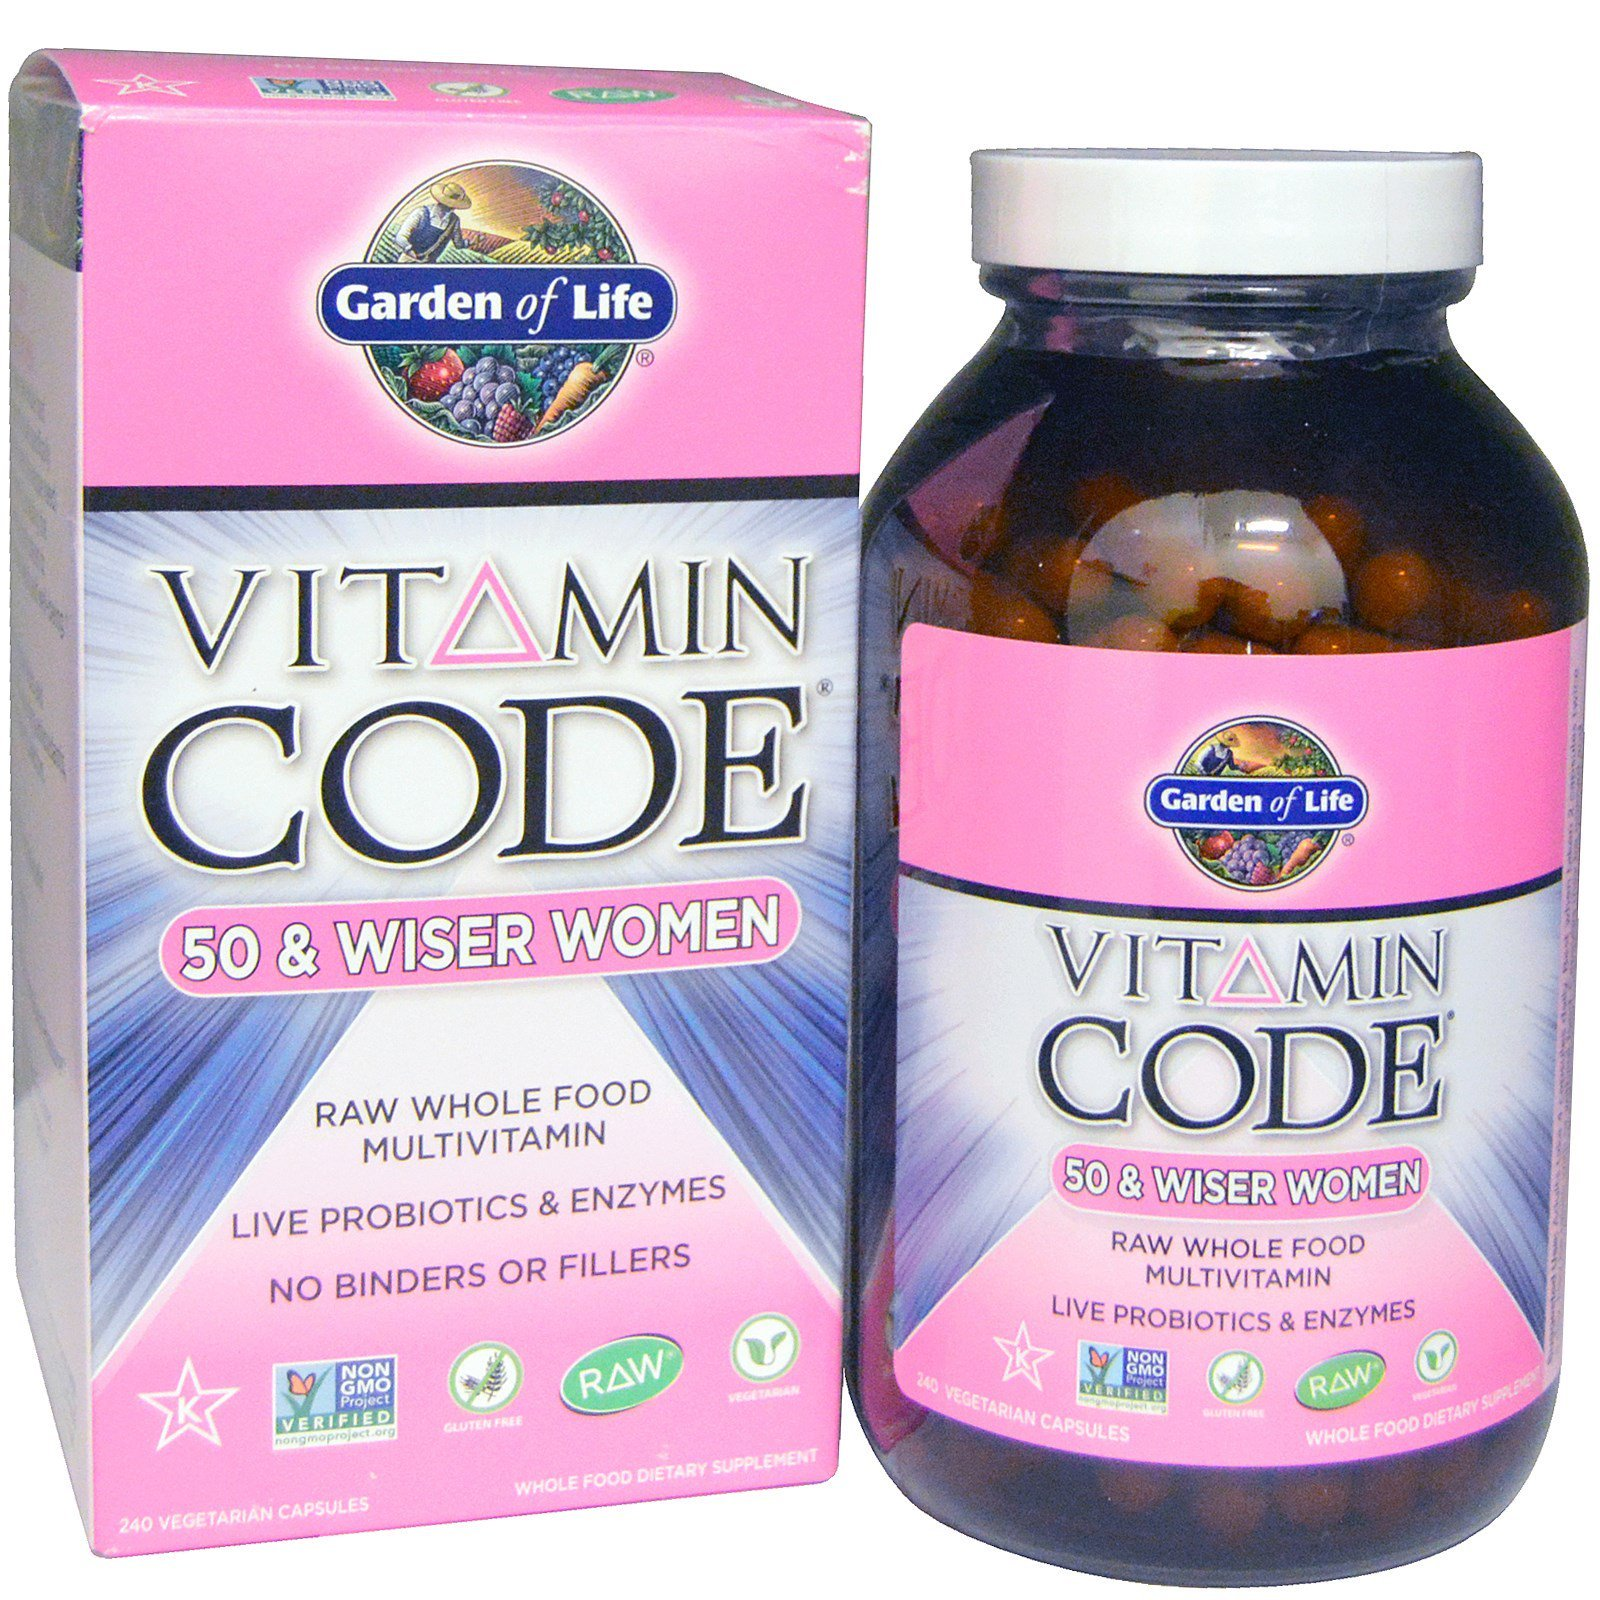 Garden of Life, Vitamin Code, 50 & Wiser Women, Raw Whole Food Multivitamin, 240 Veggie Caps